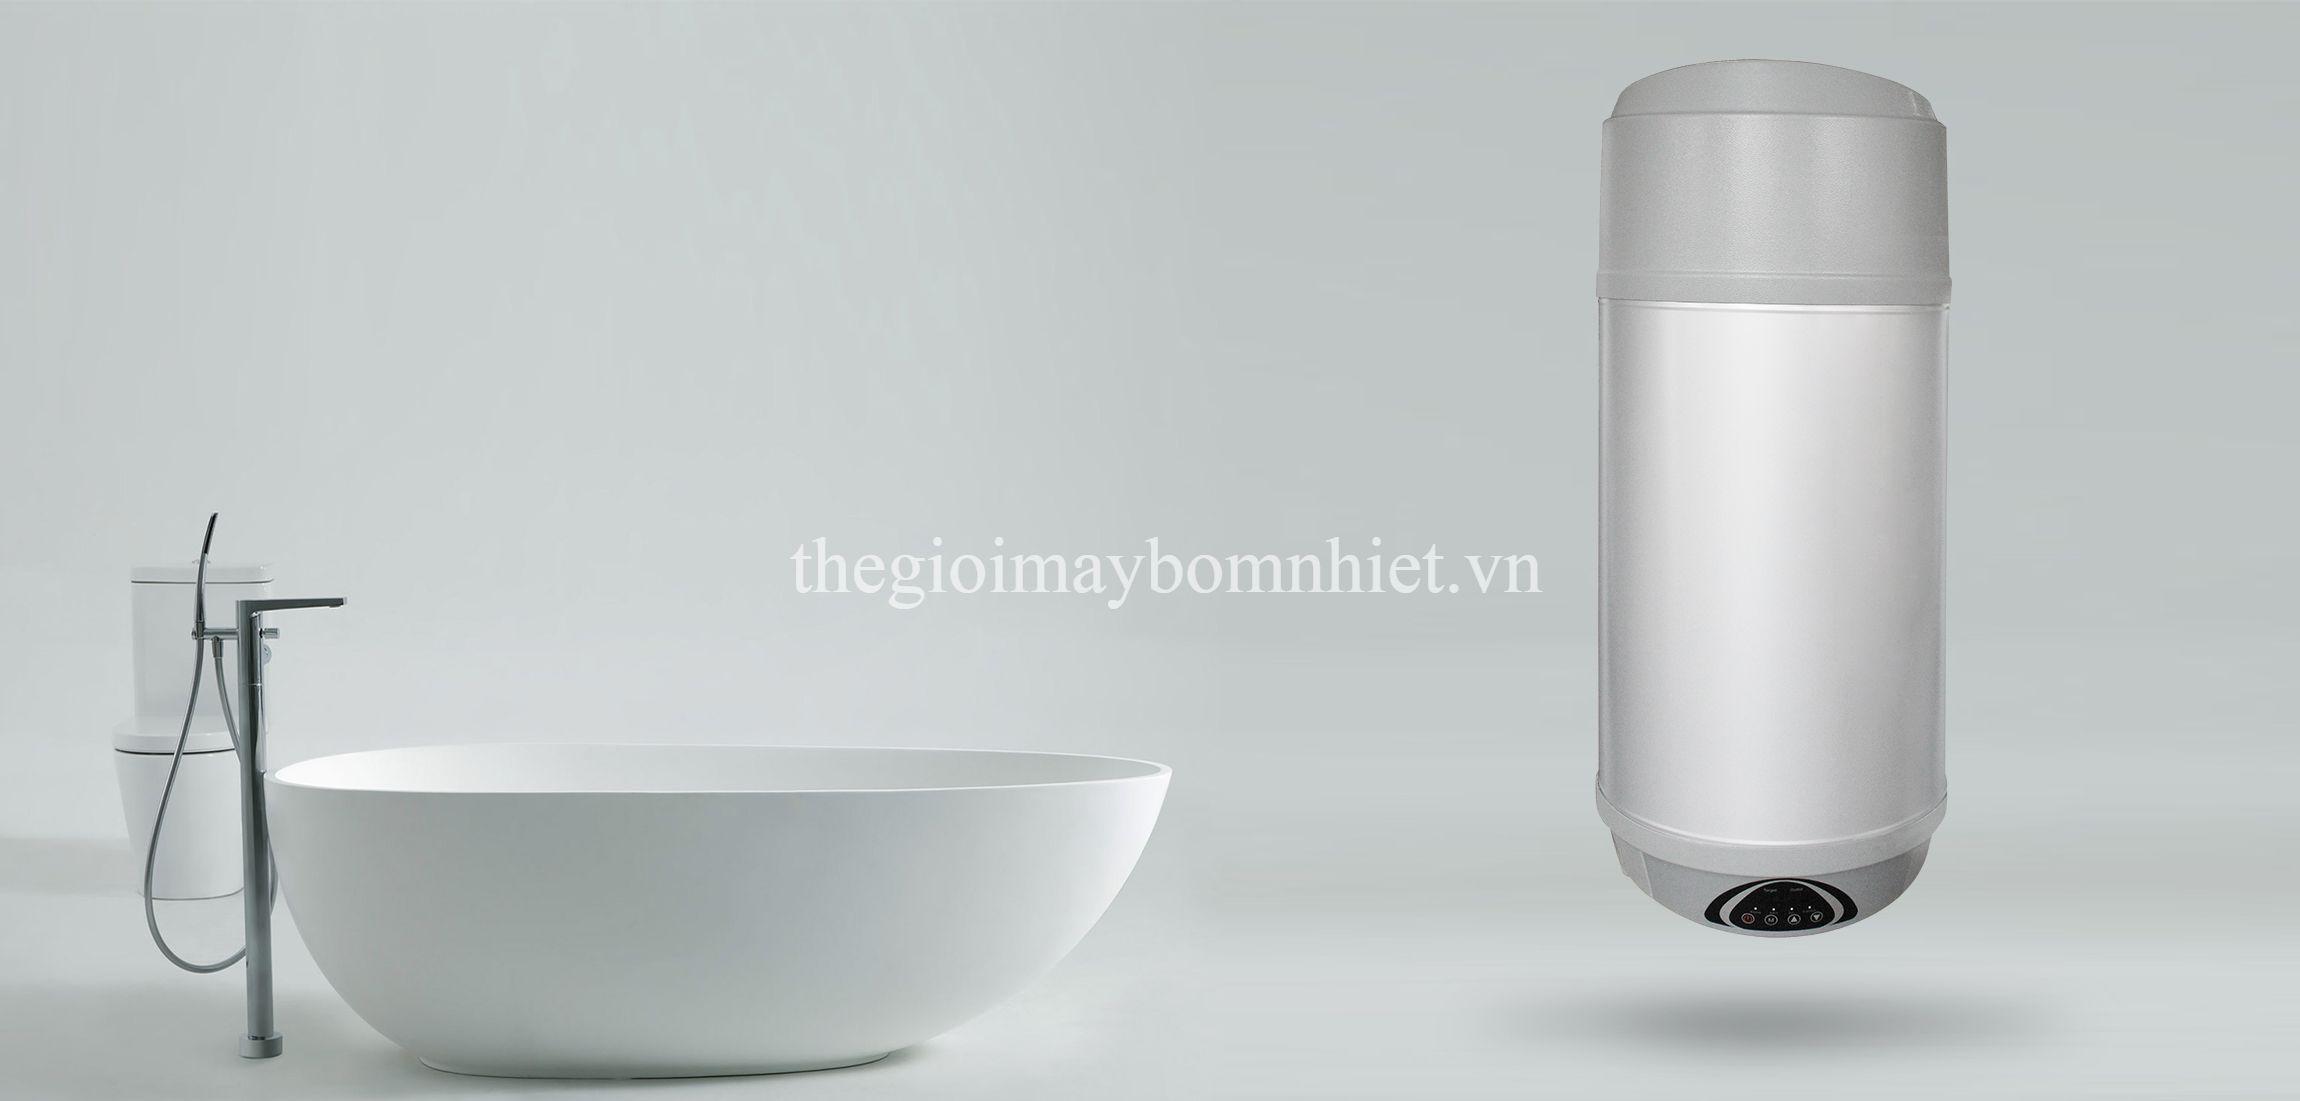 Bom Nhiet Heat Pump Megasun